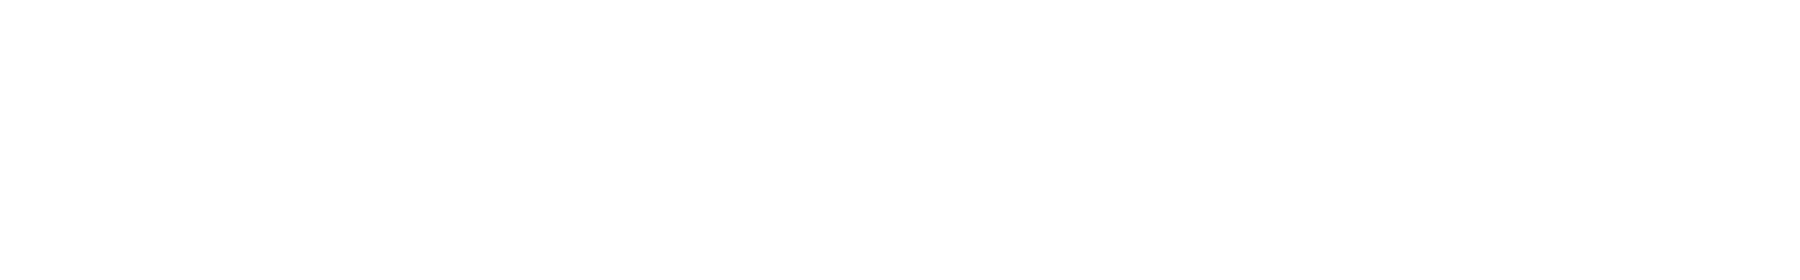 perc 1 58